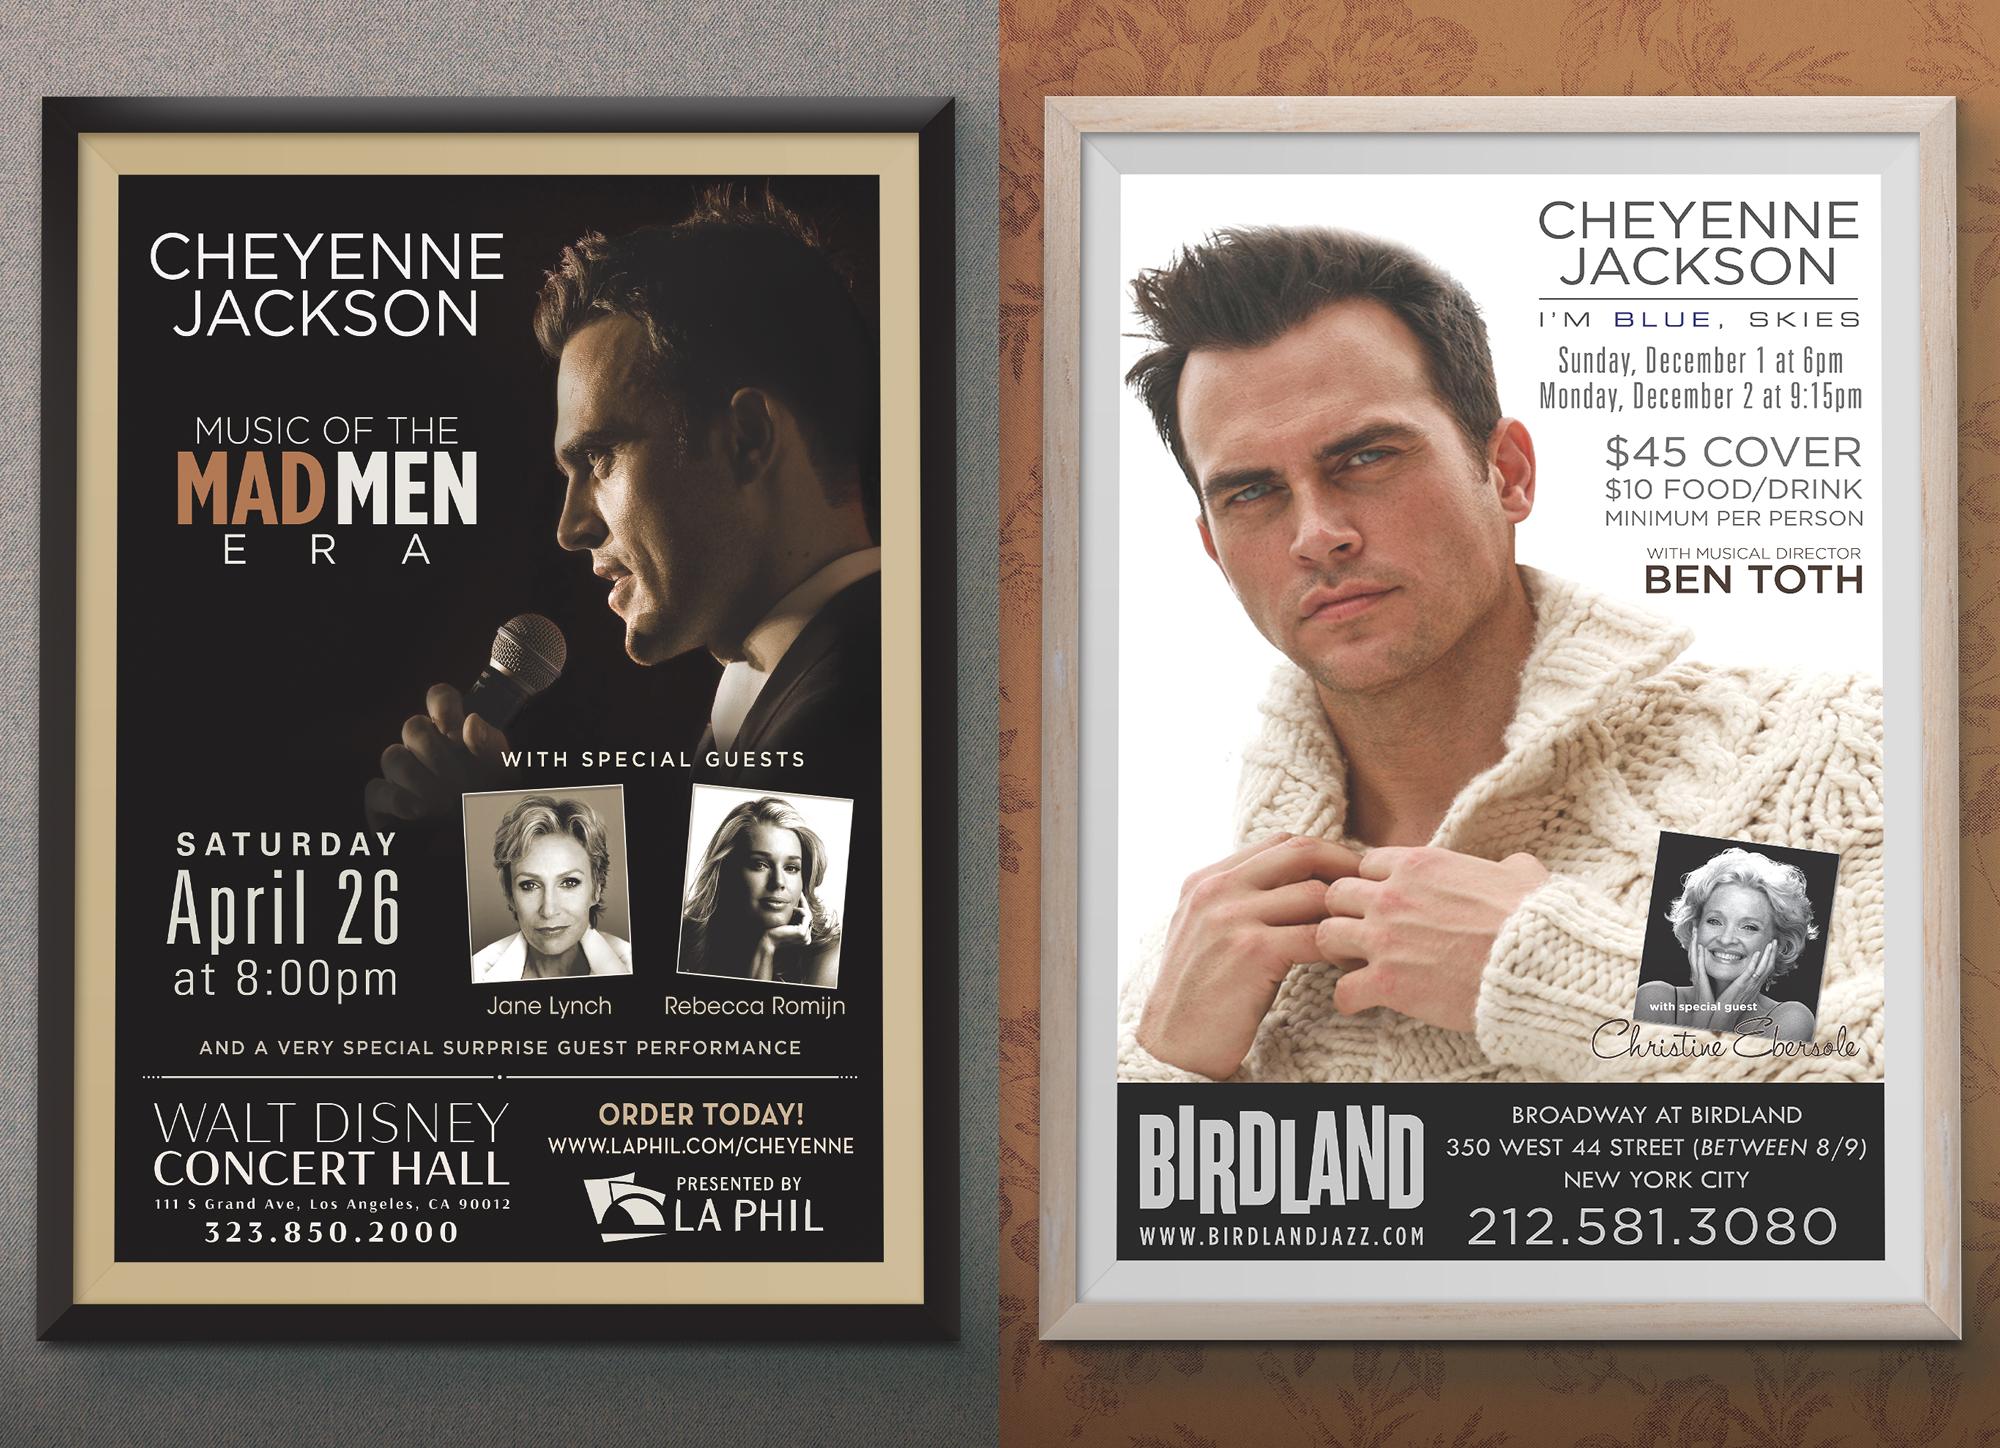 Cheyenne Jackson concert posters